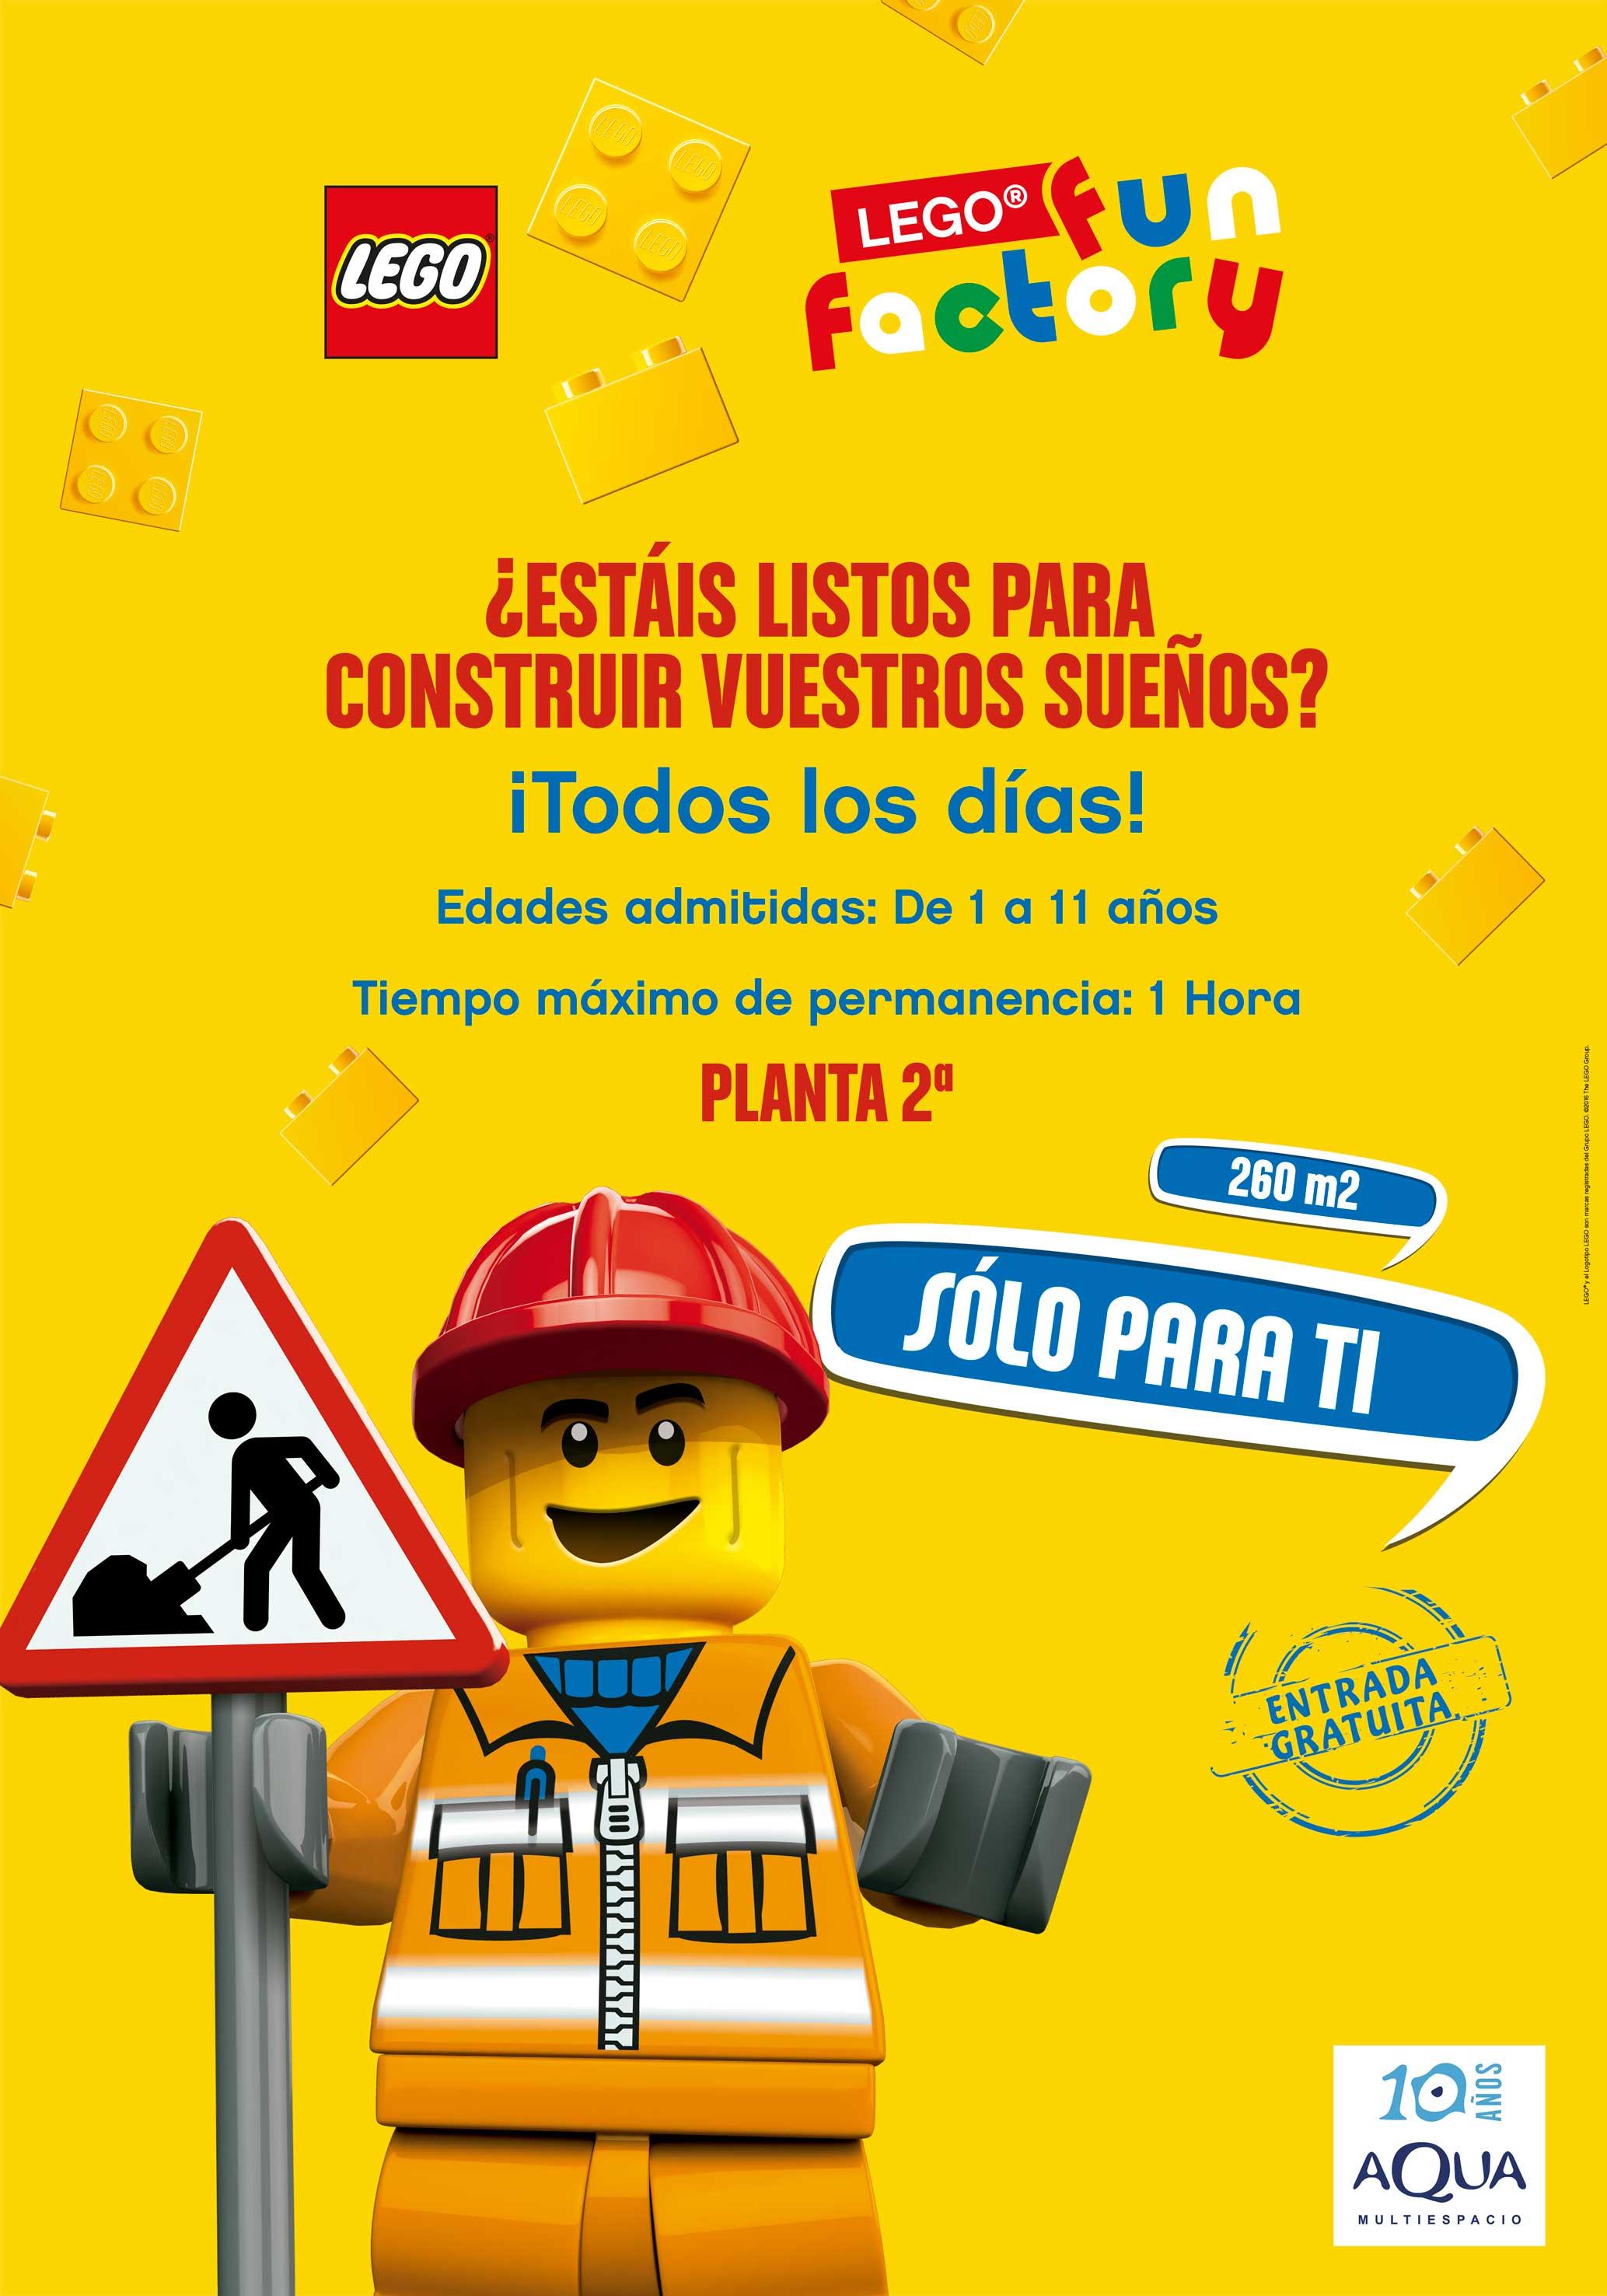 poster-70100-aqua-constructor-suenos-low